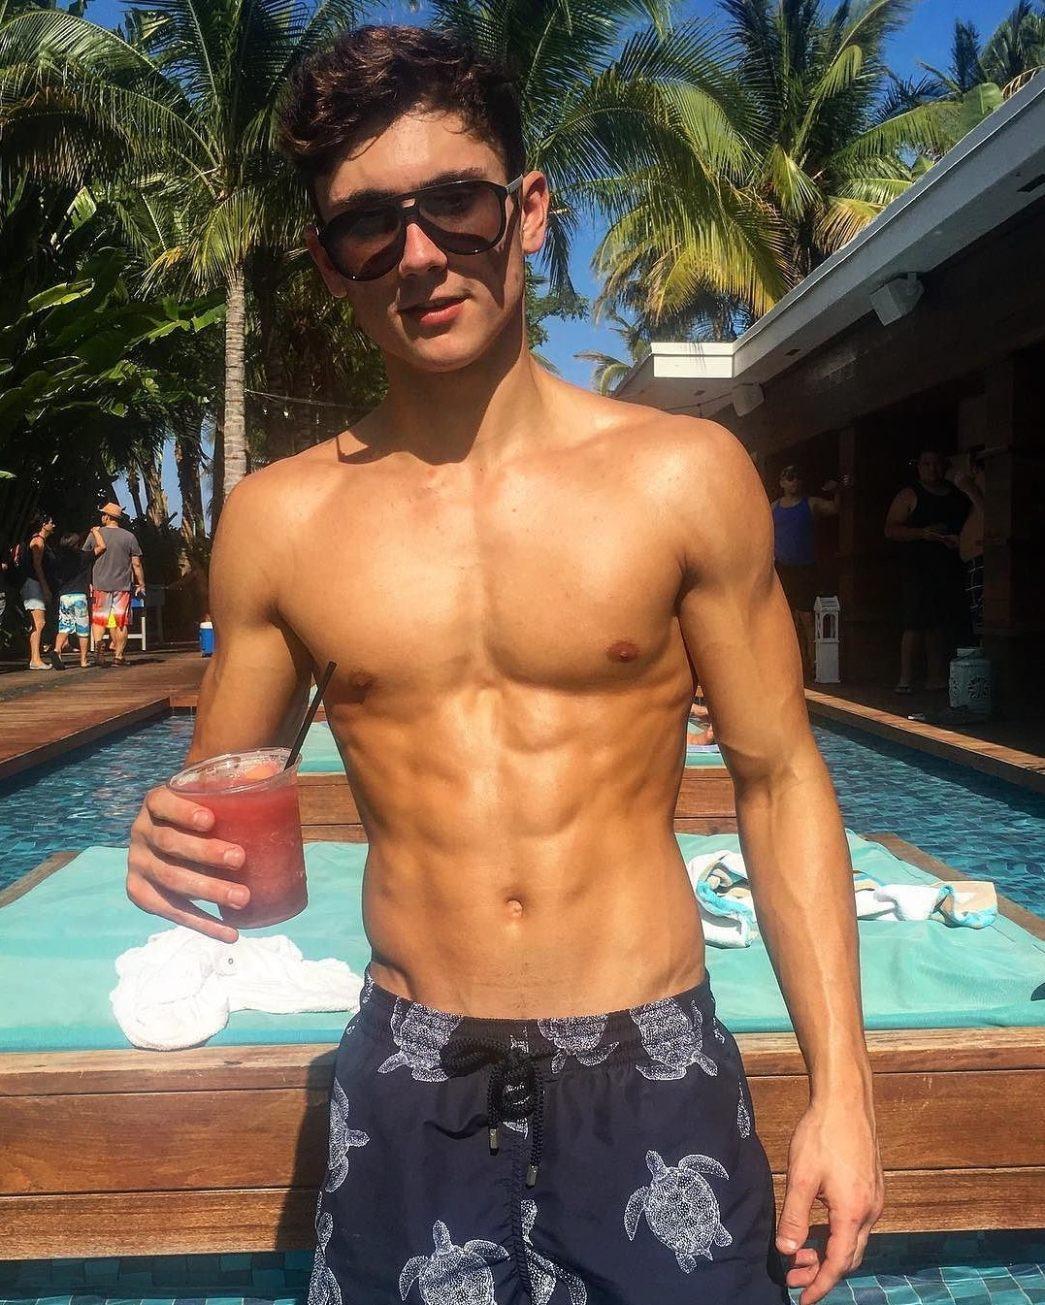 cute-american-korean-mixed-shirtless-slim-fit-boy-drinking-sunglasses-pool